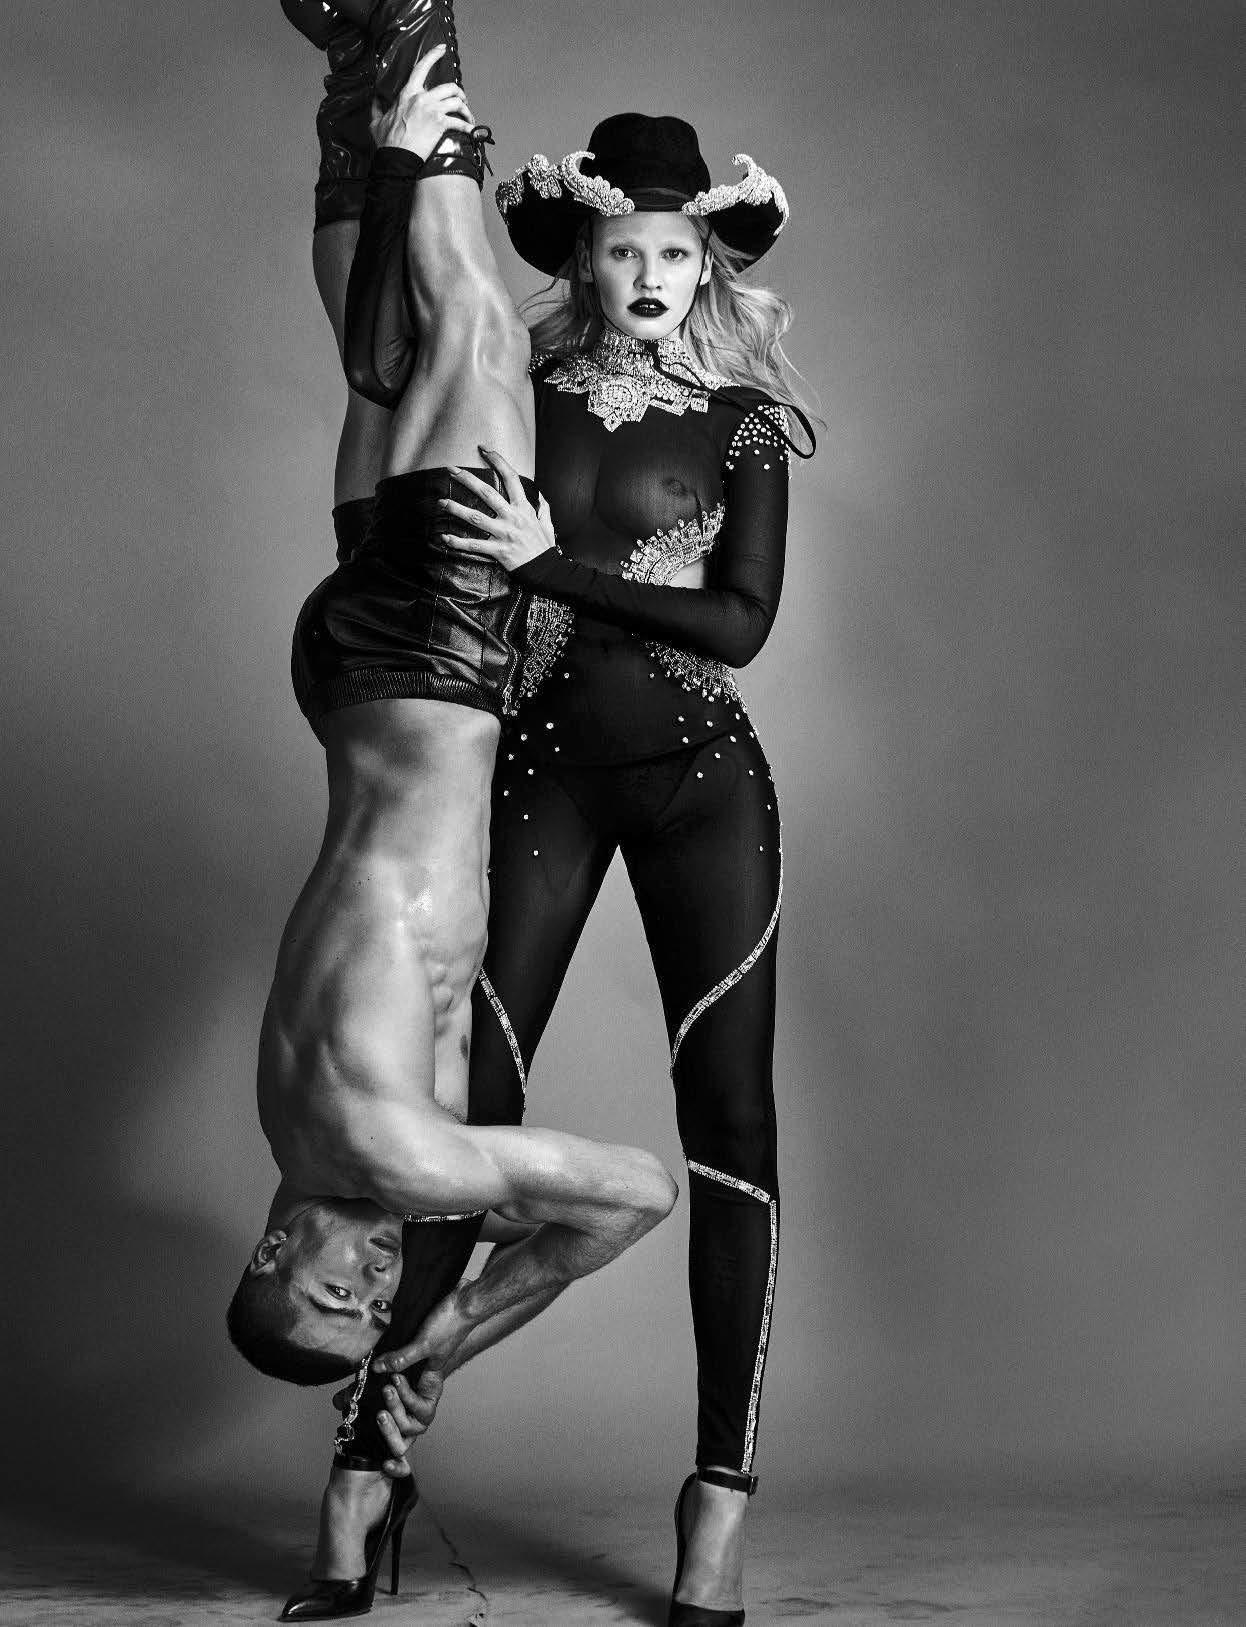 Erotica Lara Stone nude photos 2019